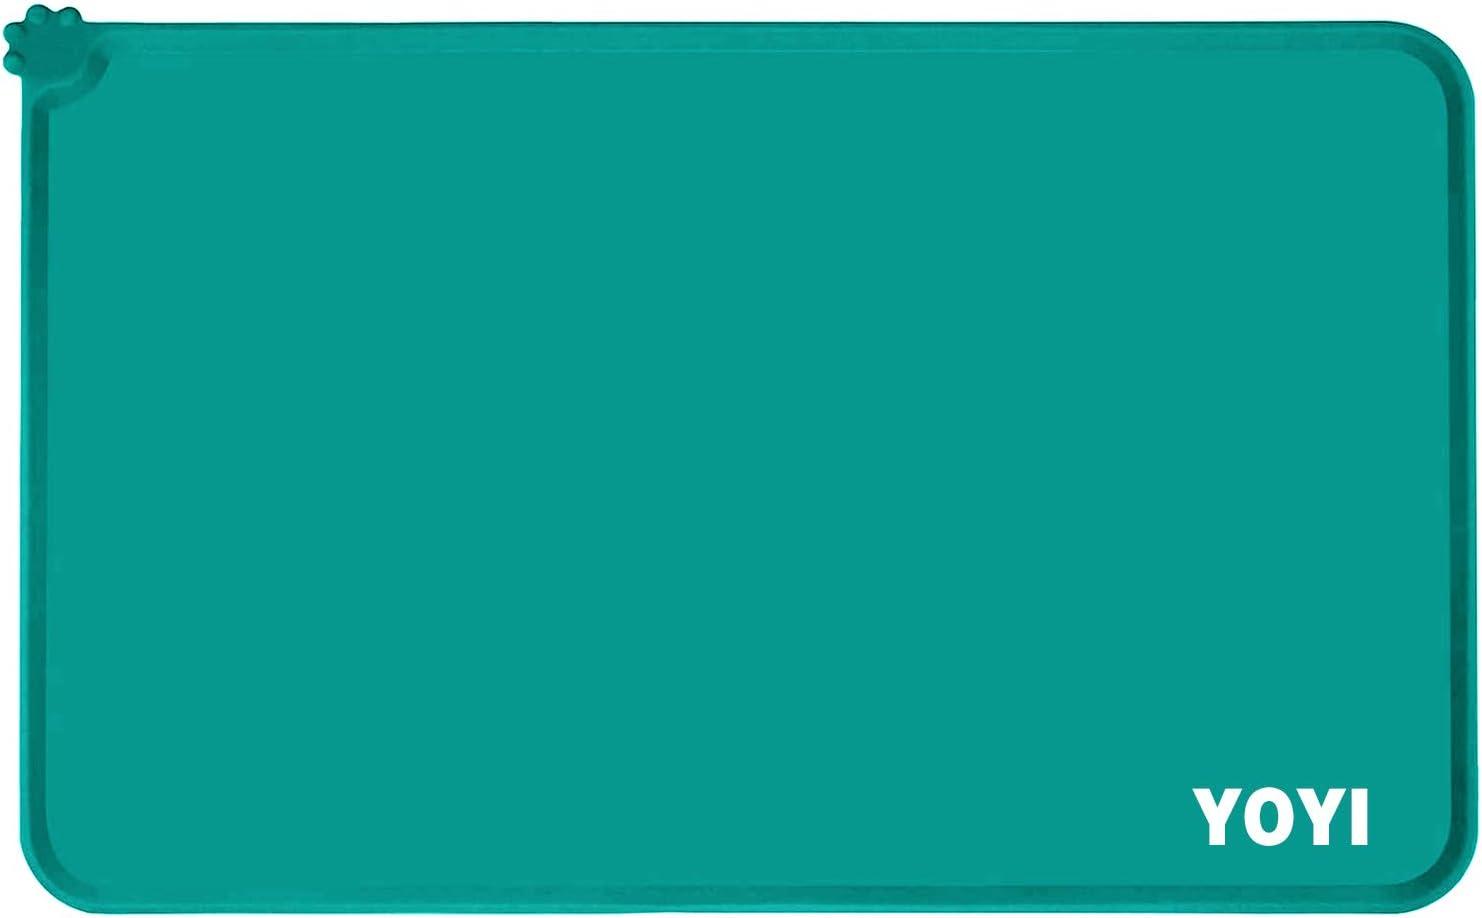 PinRui YOYI Dog Cat Food Mat,Anti-Slip Pet Bowl Mats,Silicone Dog Bowl Mat,Pet Feeding Mat, Nonslip Pet Food Mat,Washable Dog Mat for Food and Water, Waterproof Dog Food Mats for Floors